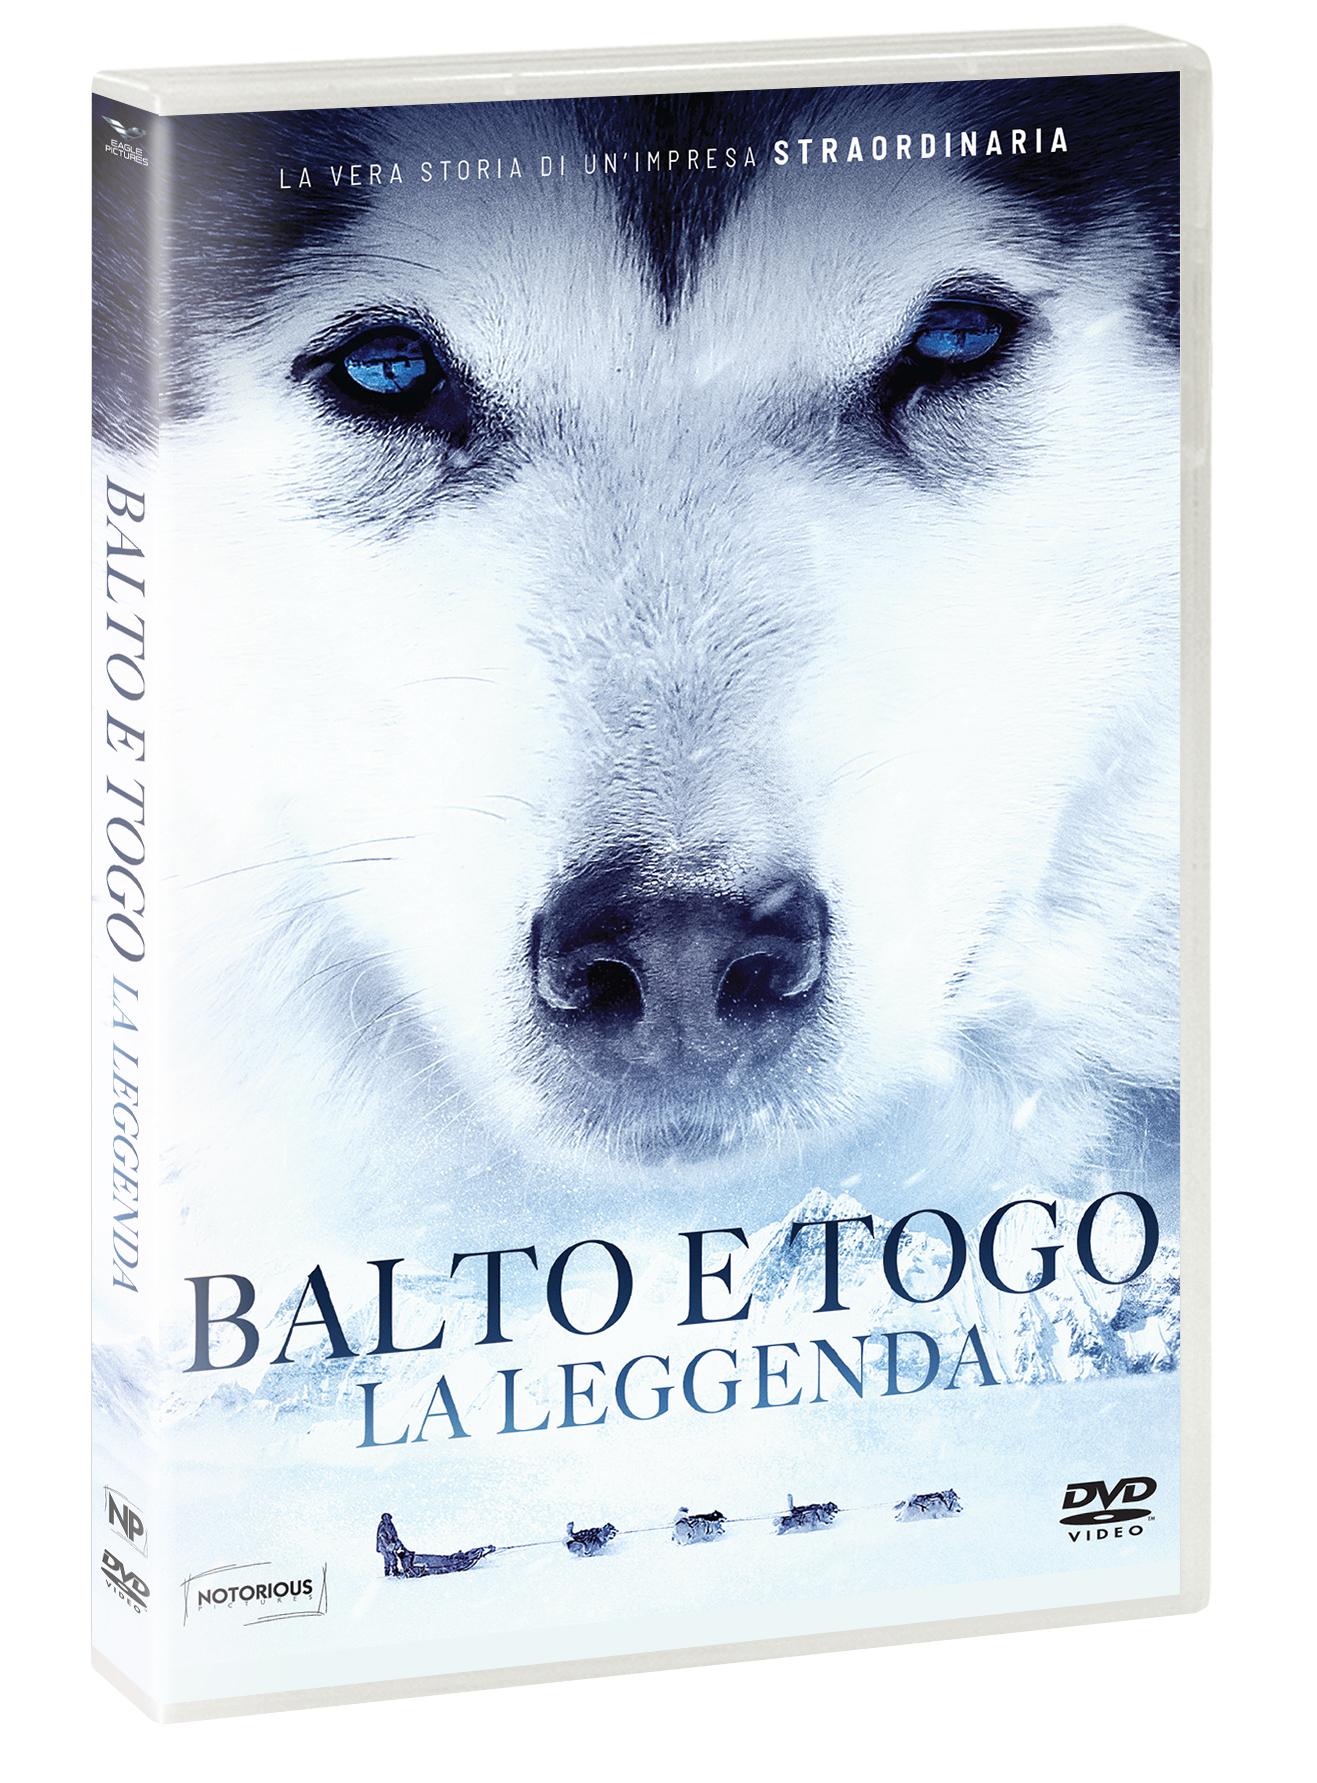 BALTO E TOGO - LA LEGGENDA (DVD)